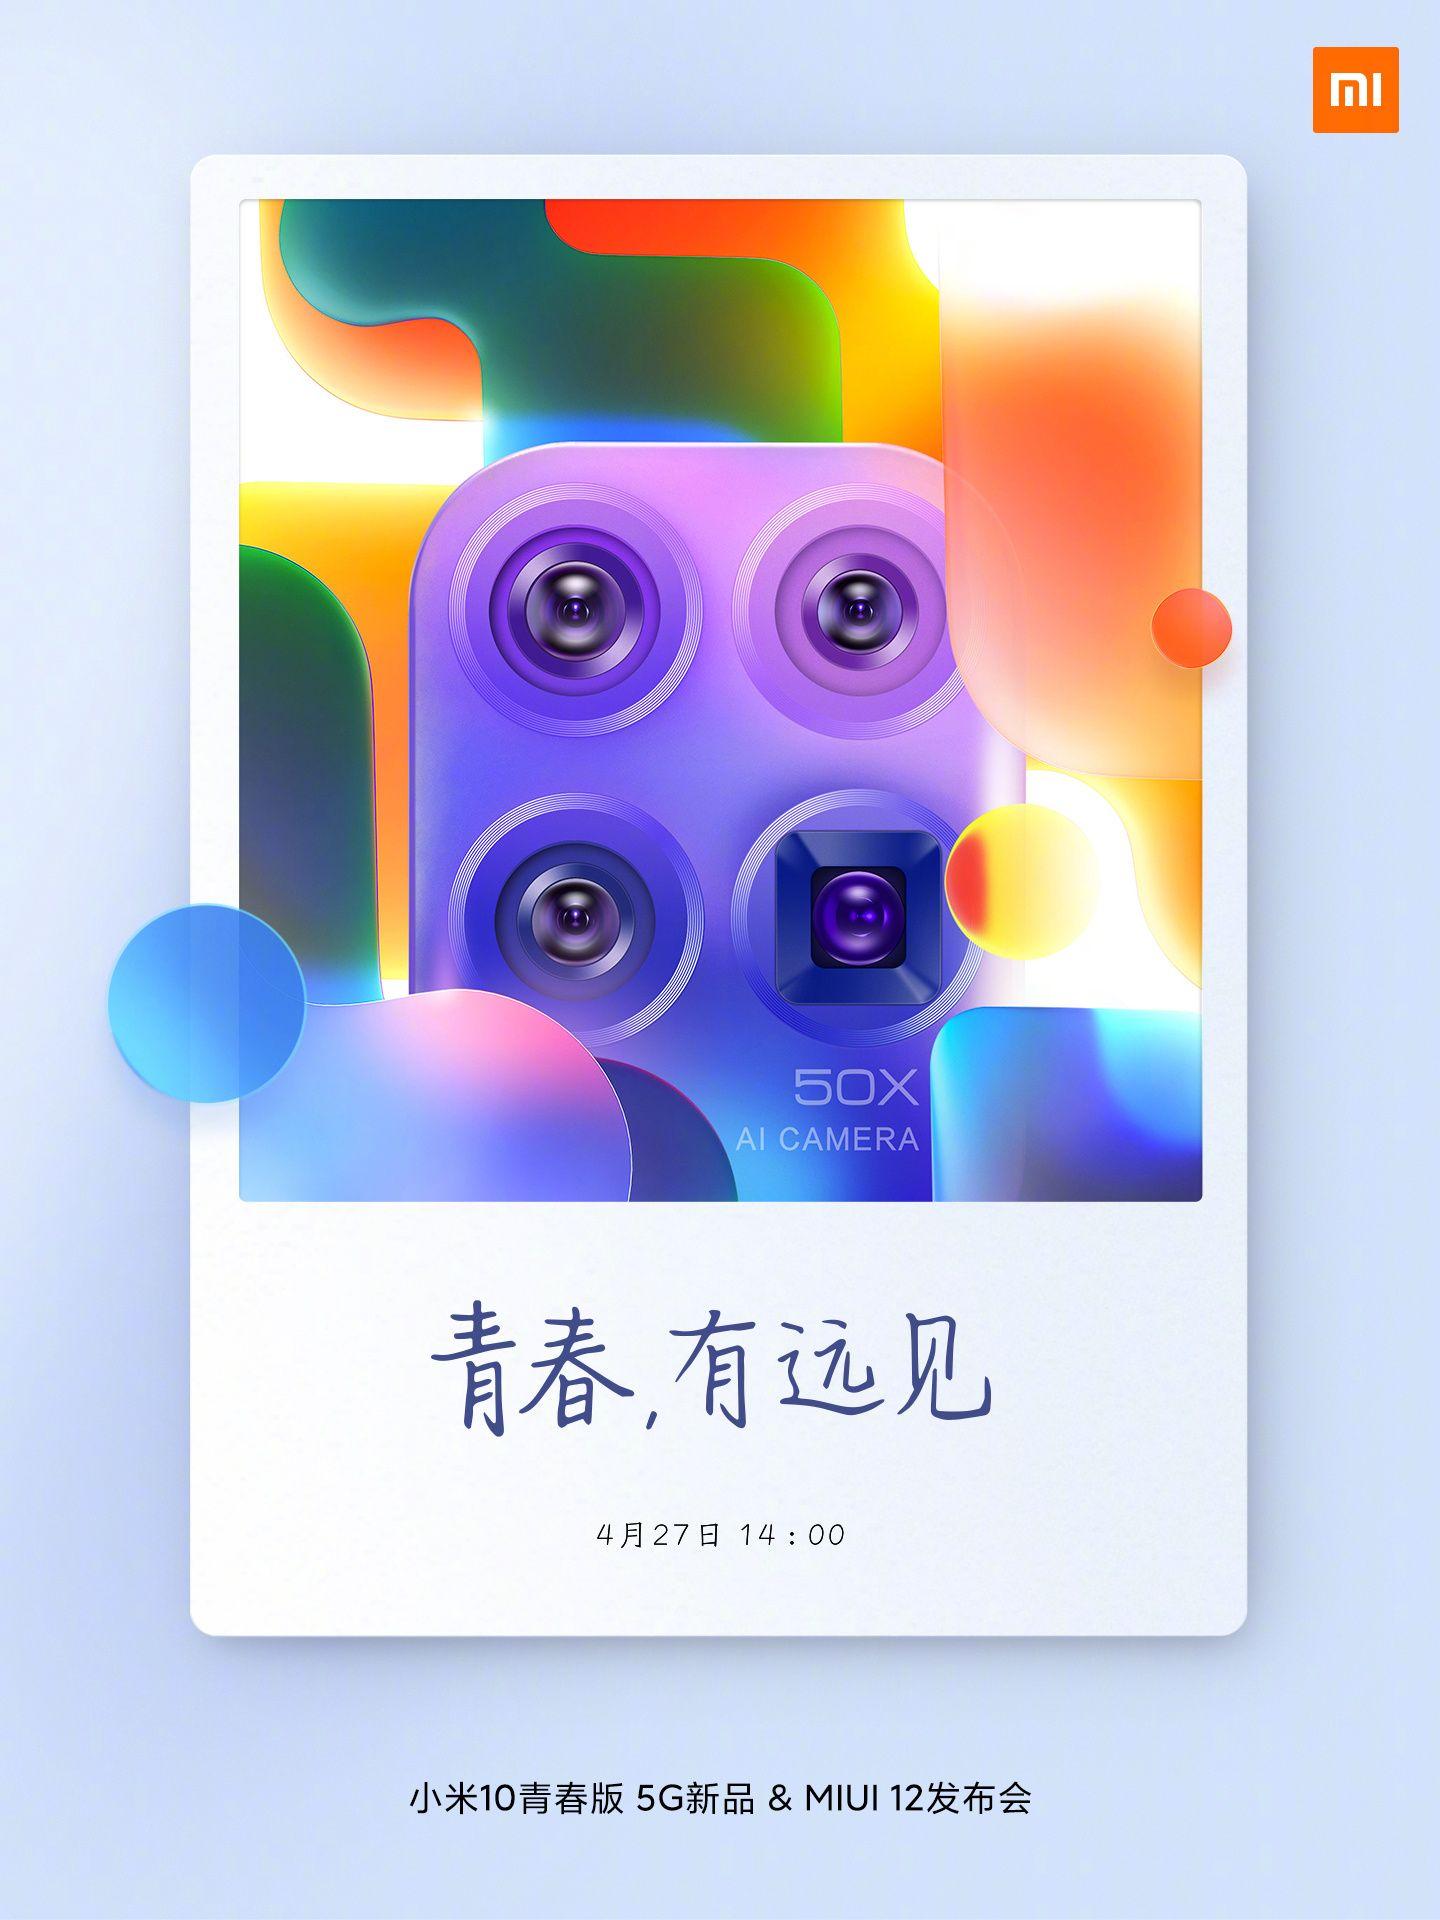 Pin by 学良 on Xiaomi小米 in 2020 Xiaomi, Design language